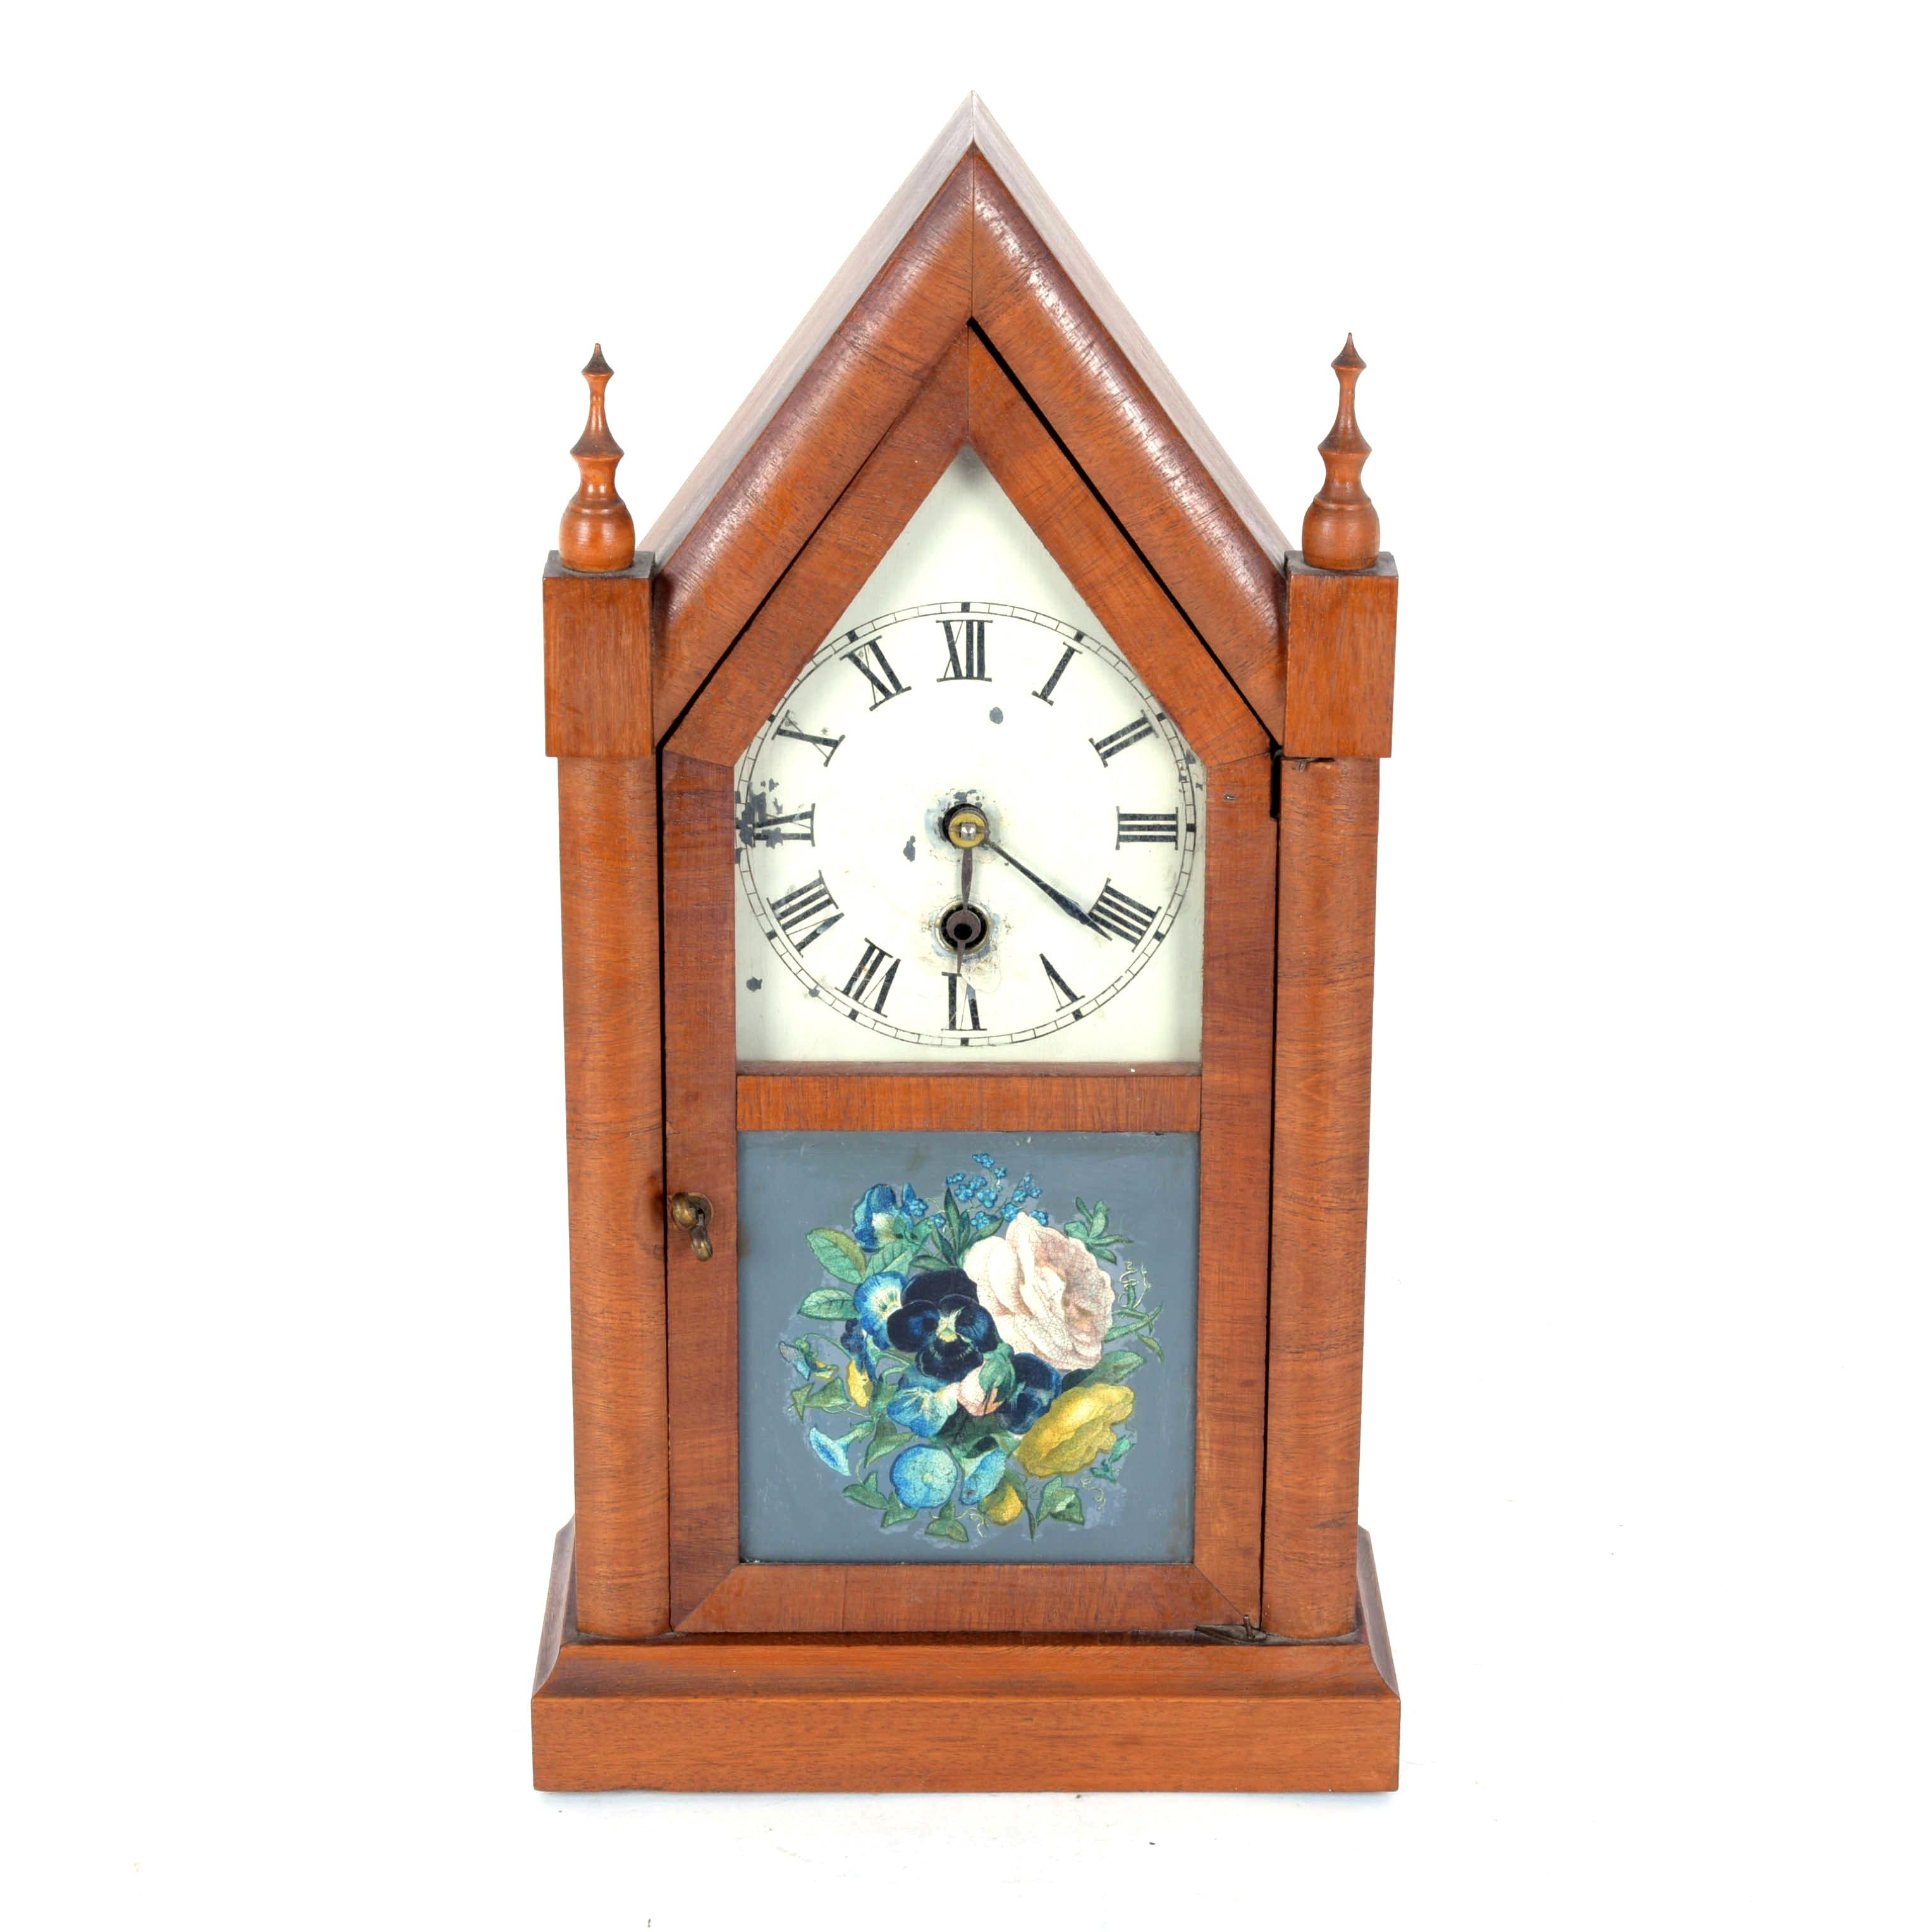 Circa 1850 E.N. Welch Cathedral Clock